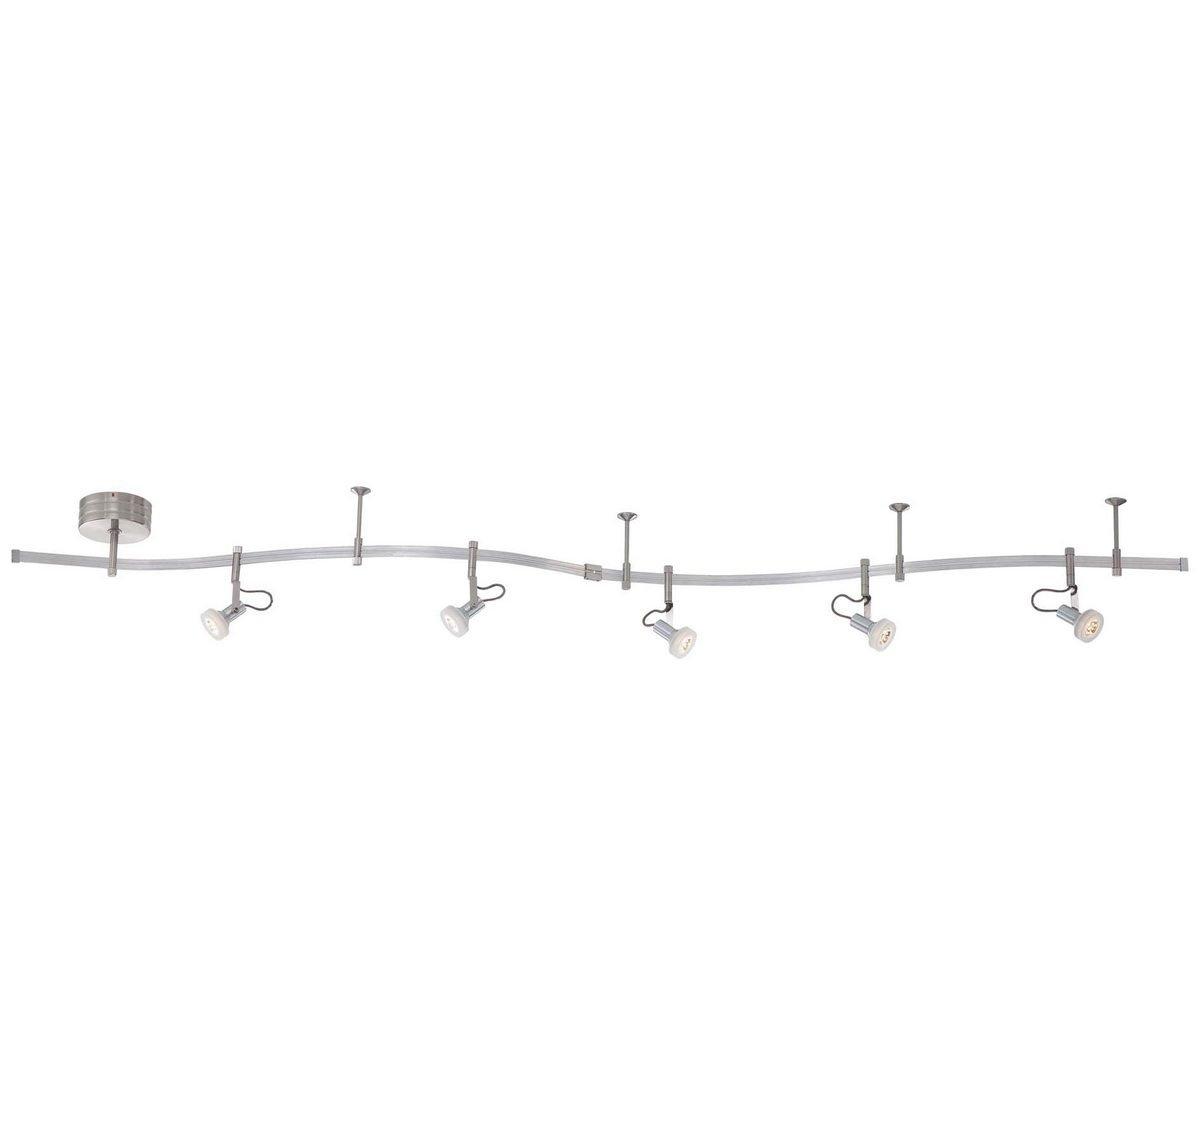 George Kovacs P4305-084, LED Accent Light Kit, Silver